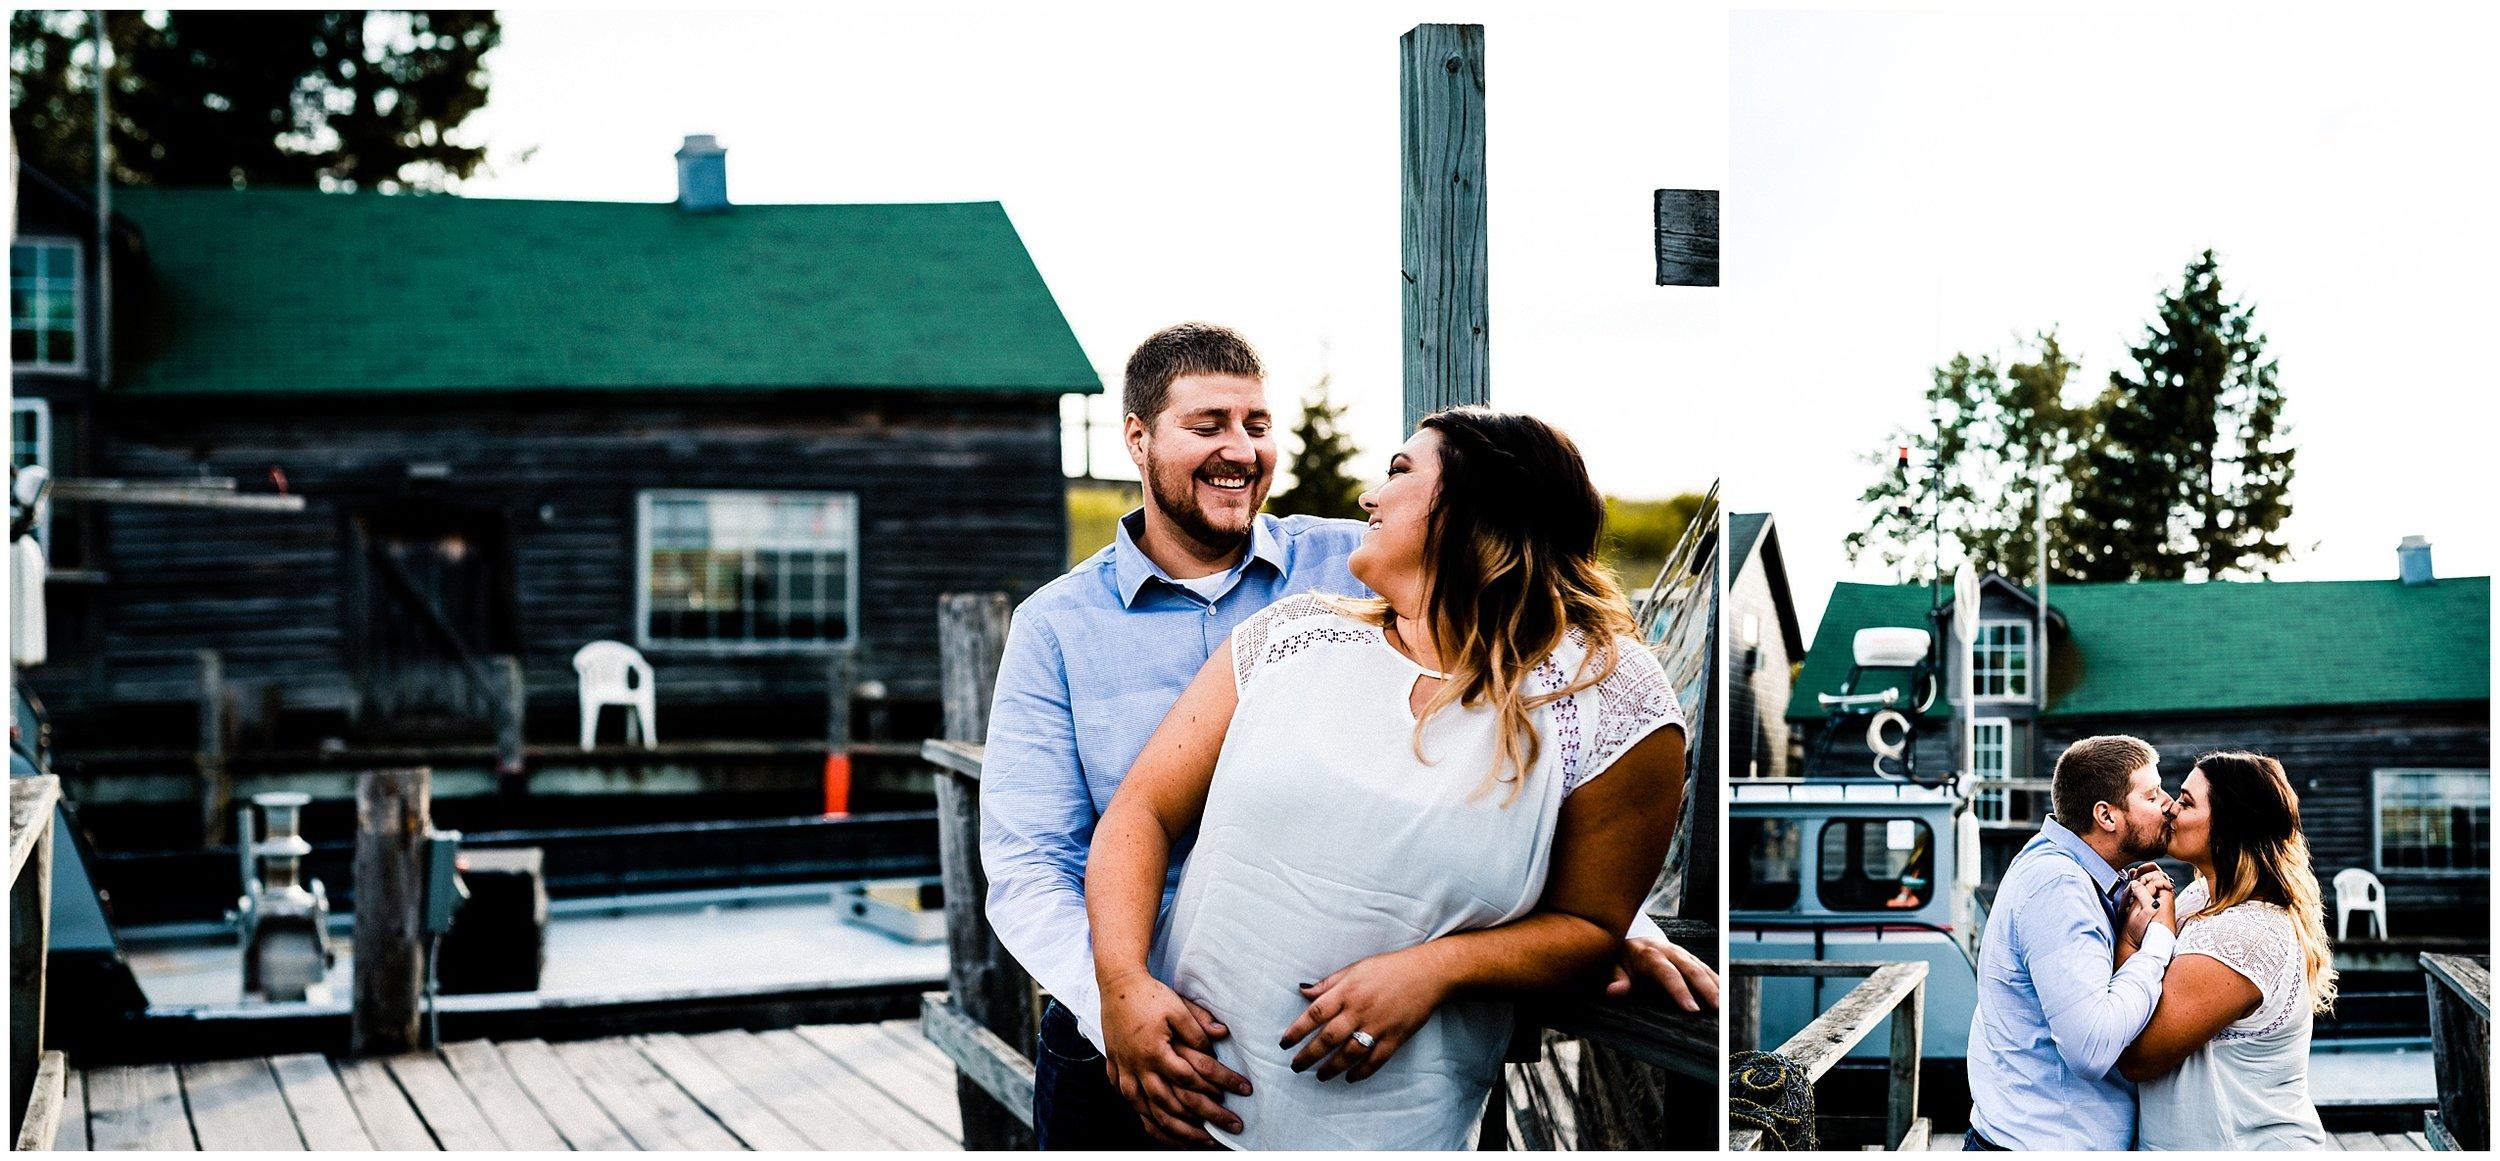 Kyle + Emily | Engaged #kyleepaigephotography_0489.jpg